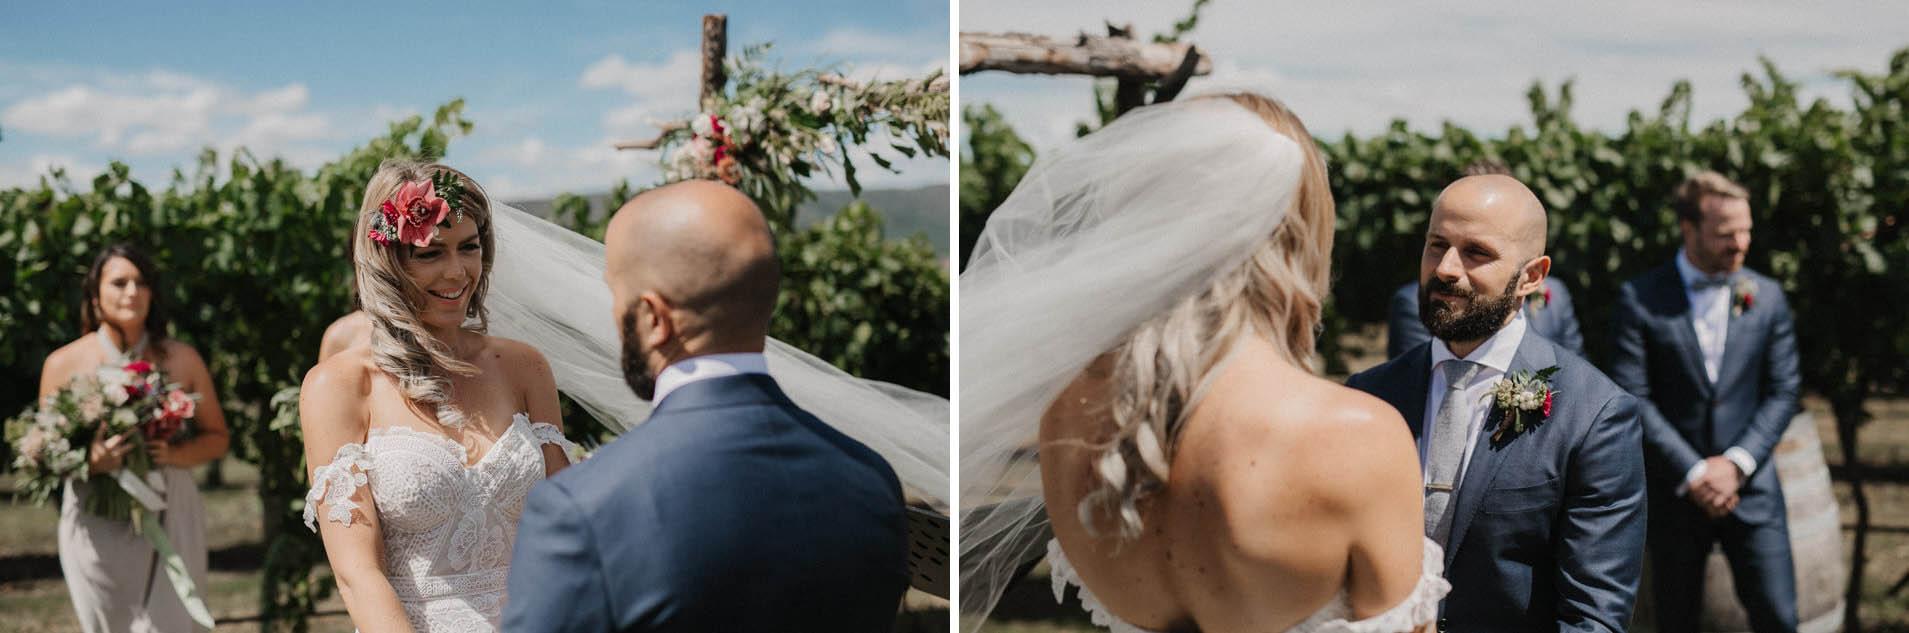 suger-pine-walk-wedding (Corinna & Dylan)_098(1099)2.jpg